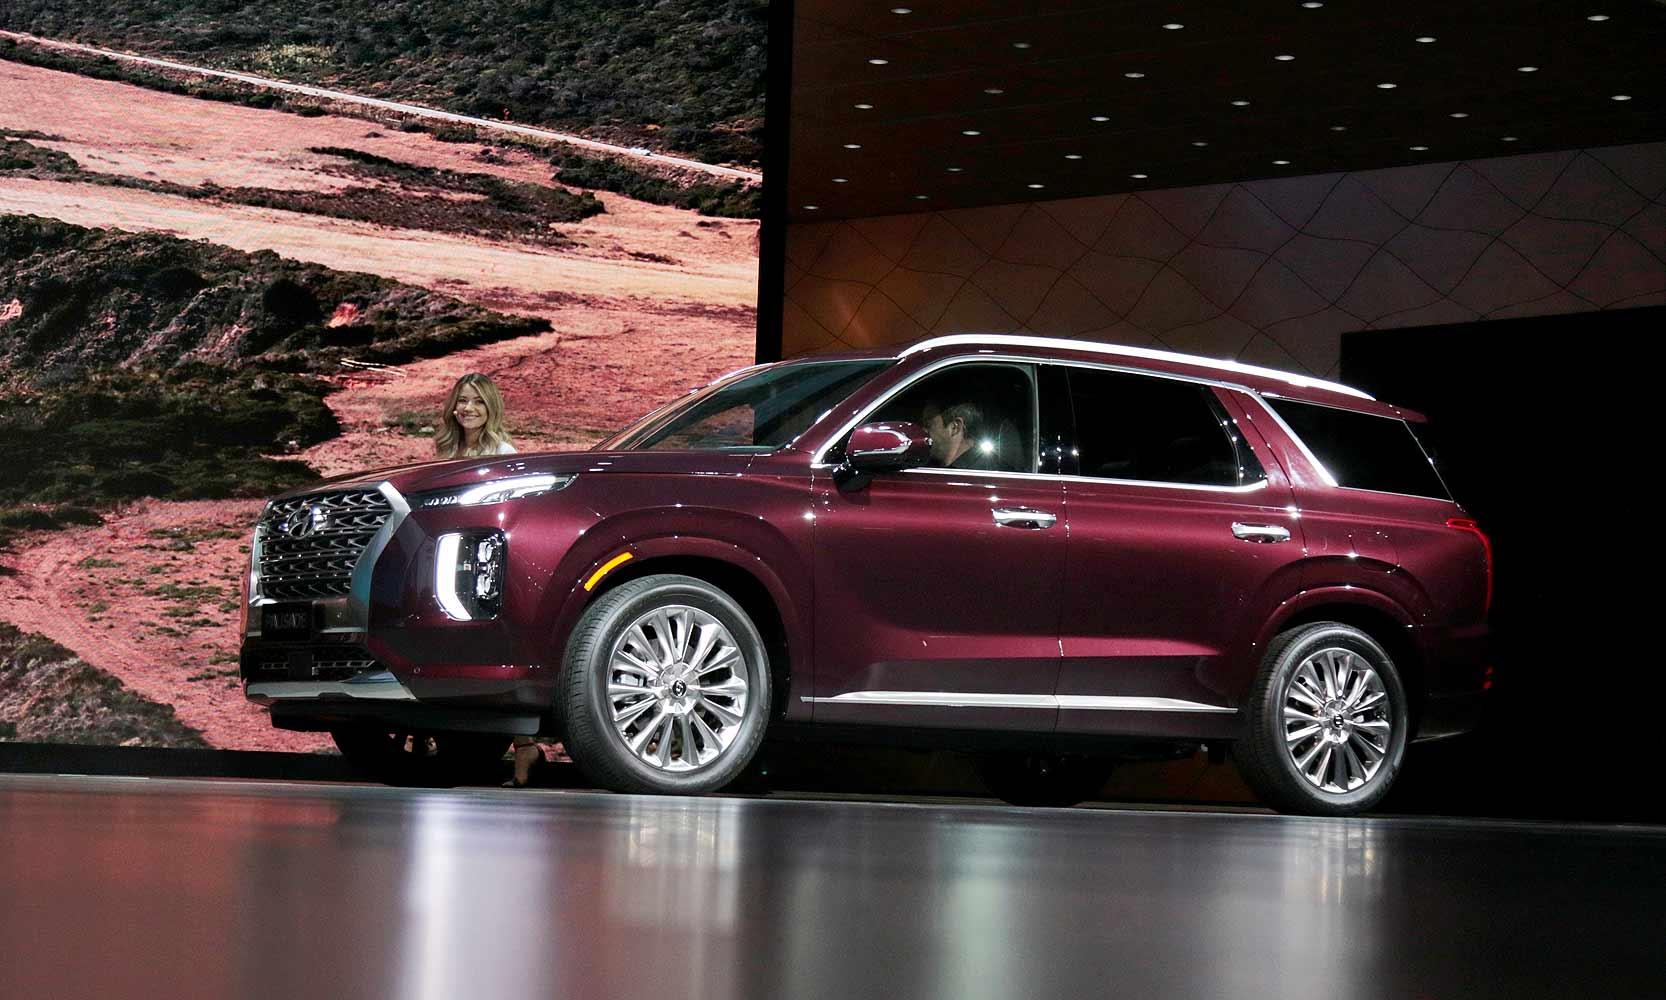 Hyundai Prices Palisade A Shade Below Kia Telluride